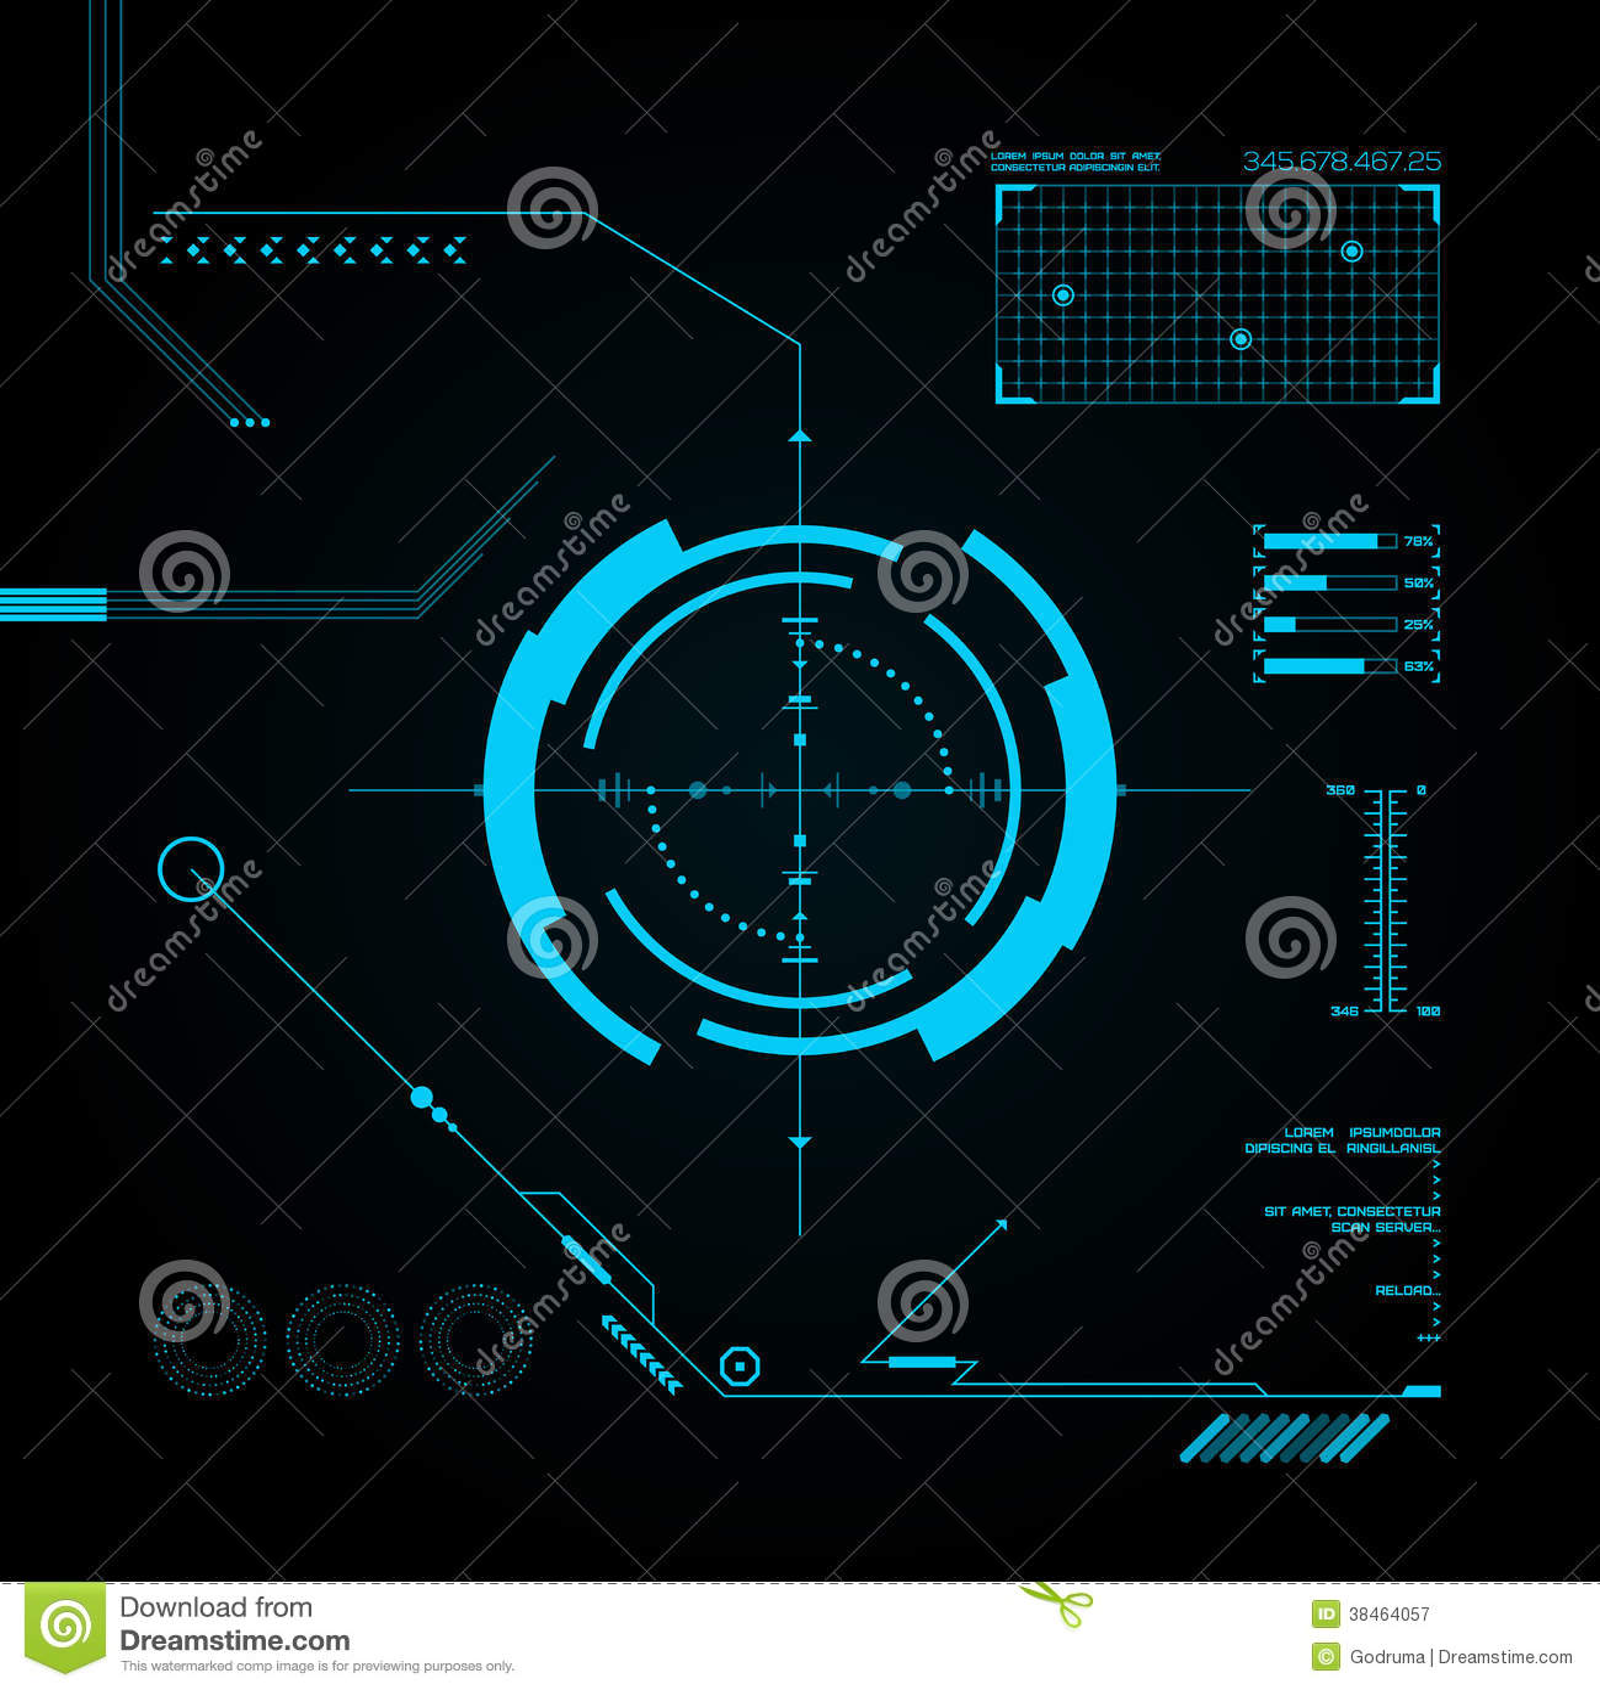 3d Hologram Wallpaper Gif Hud And Gui Set Futuristic User Interface Stock Vector